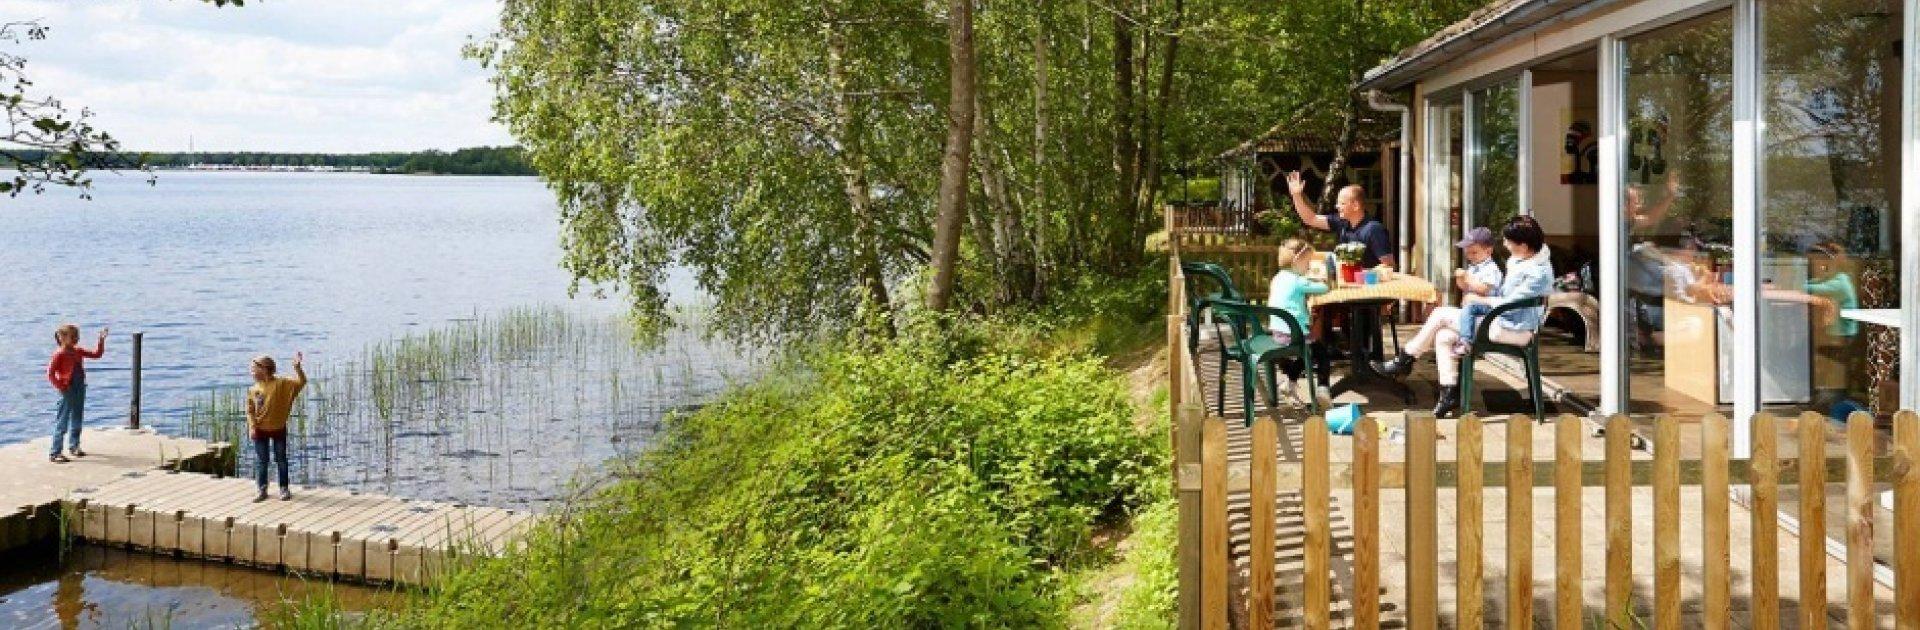 Camping Beekse Bergen